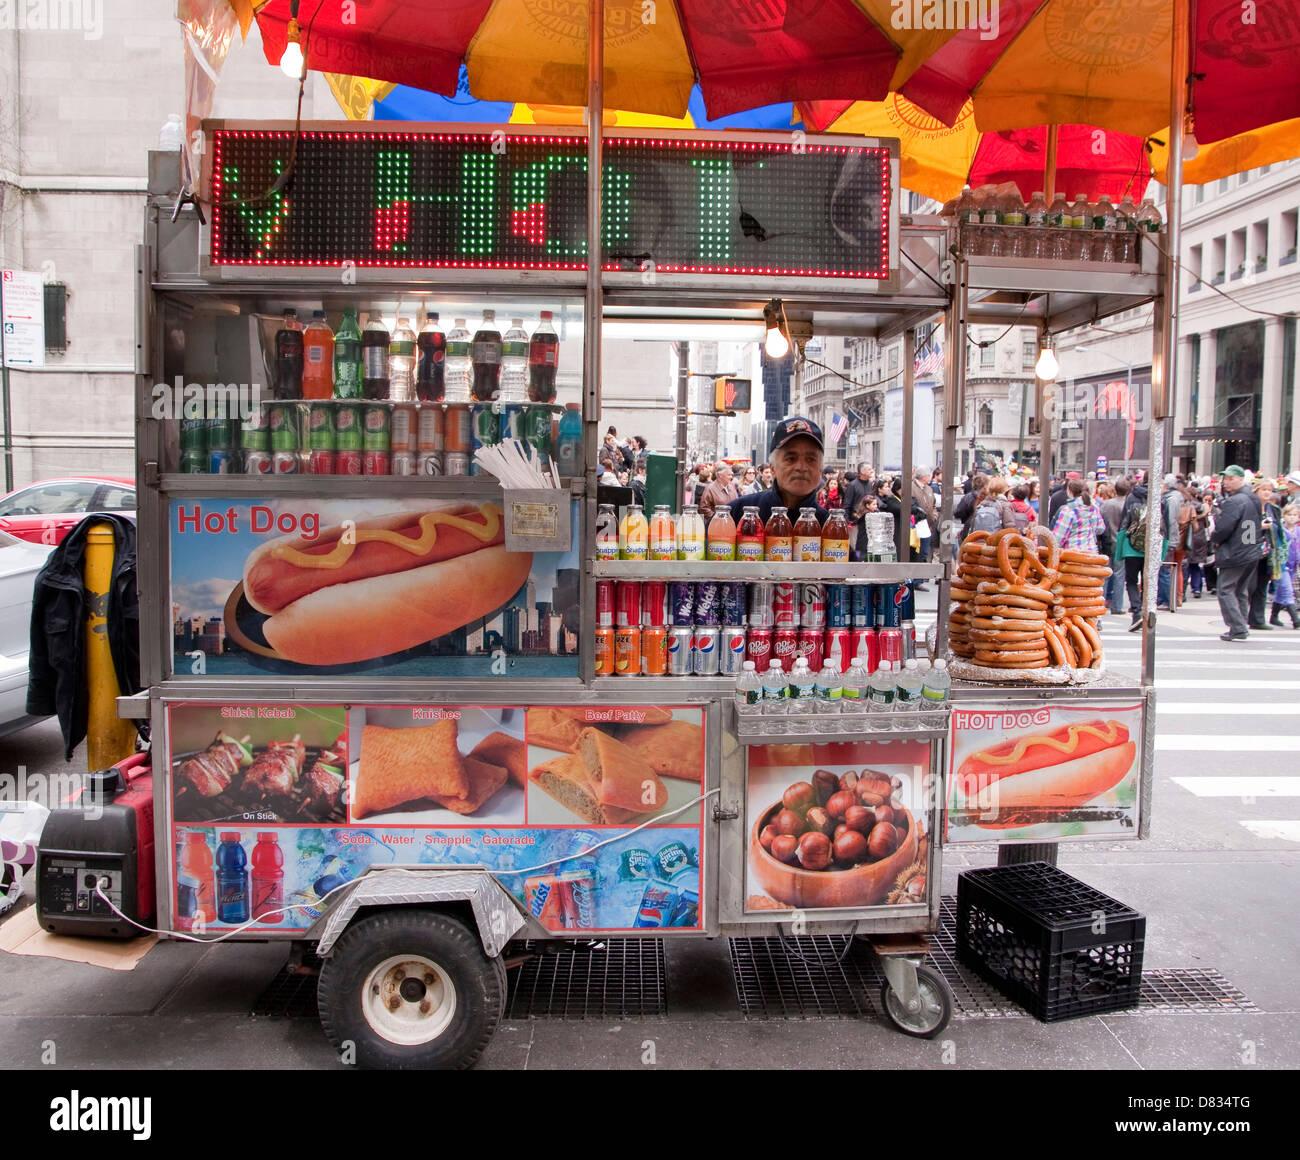 Food Truck In Midtown